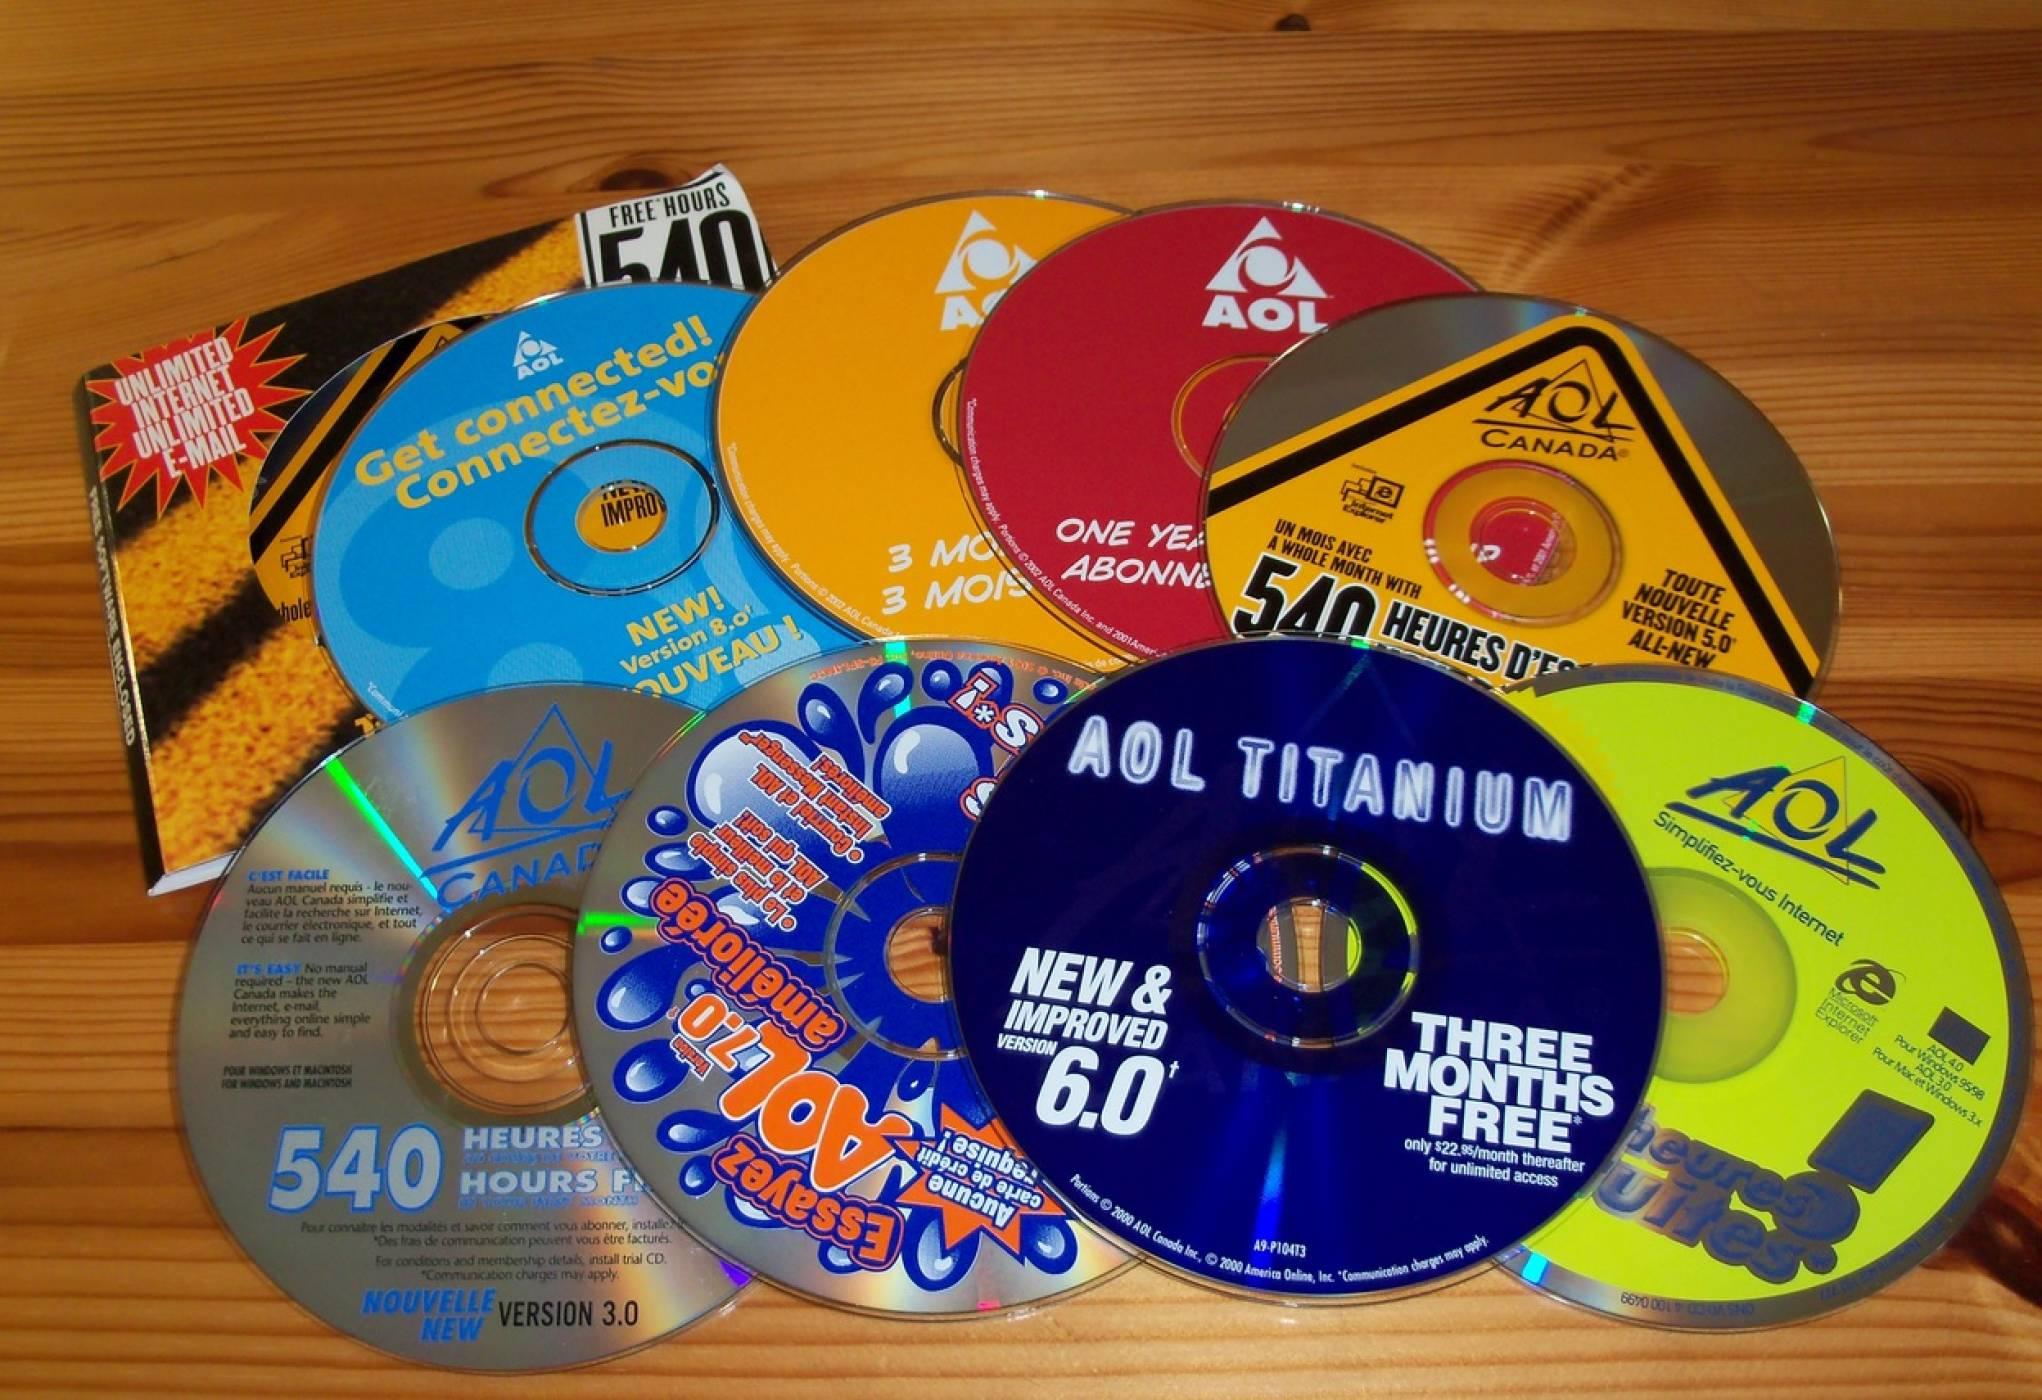 Някогашните интернет титани AOL и Yahoo продадени на загуба